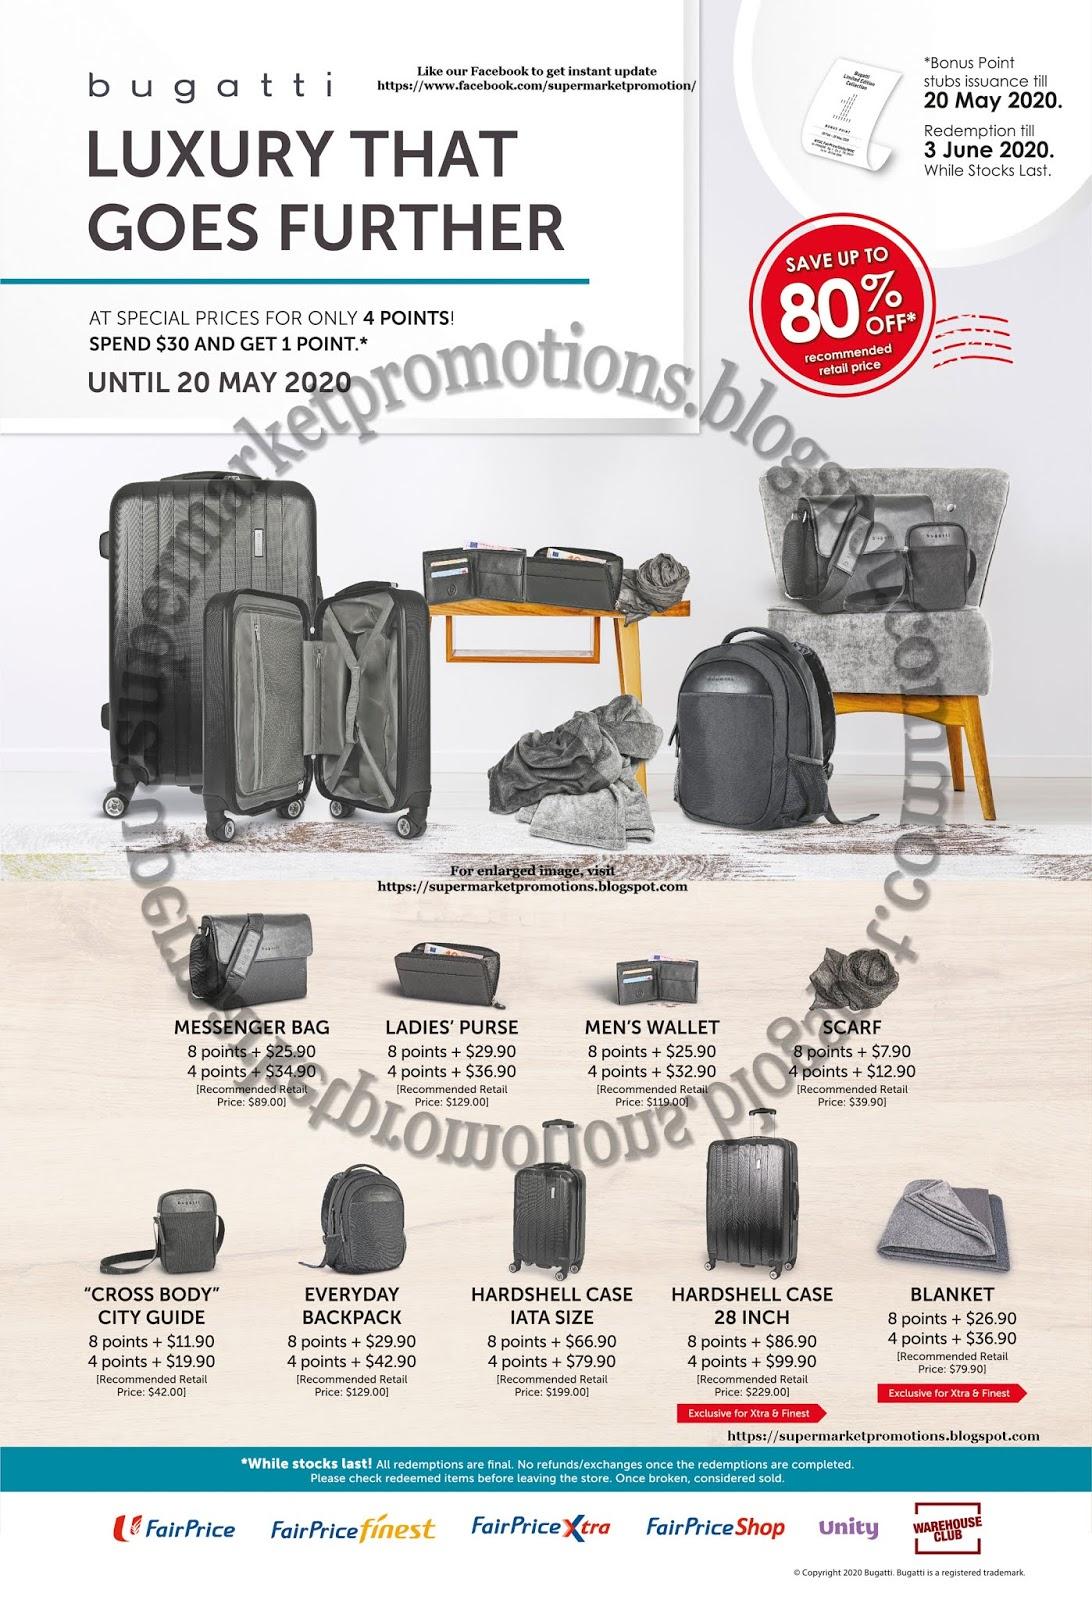 Ntuc Fairprice Redeem Bugatti Luggage Accessories Promotion 20